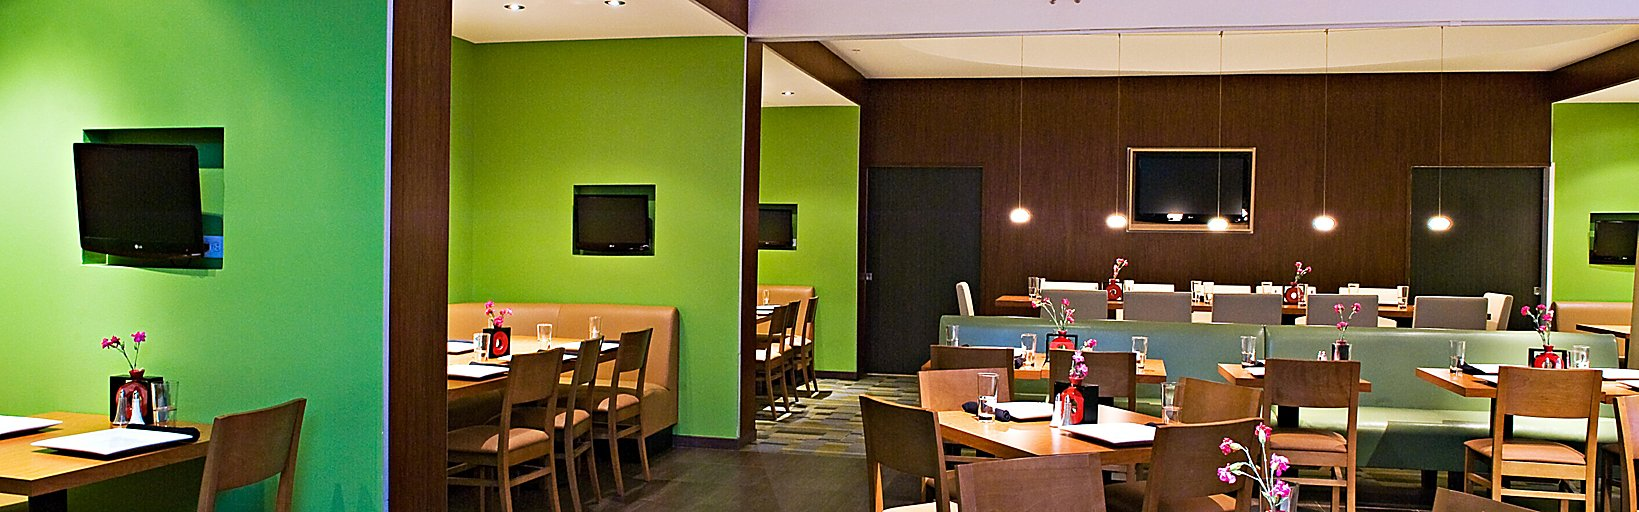 Restaurants Near Holiday Inn Dallas Fort Worth Airport S